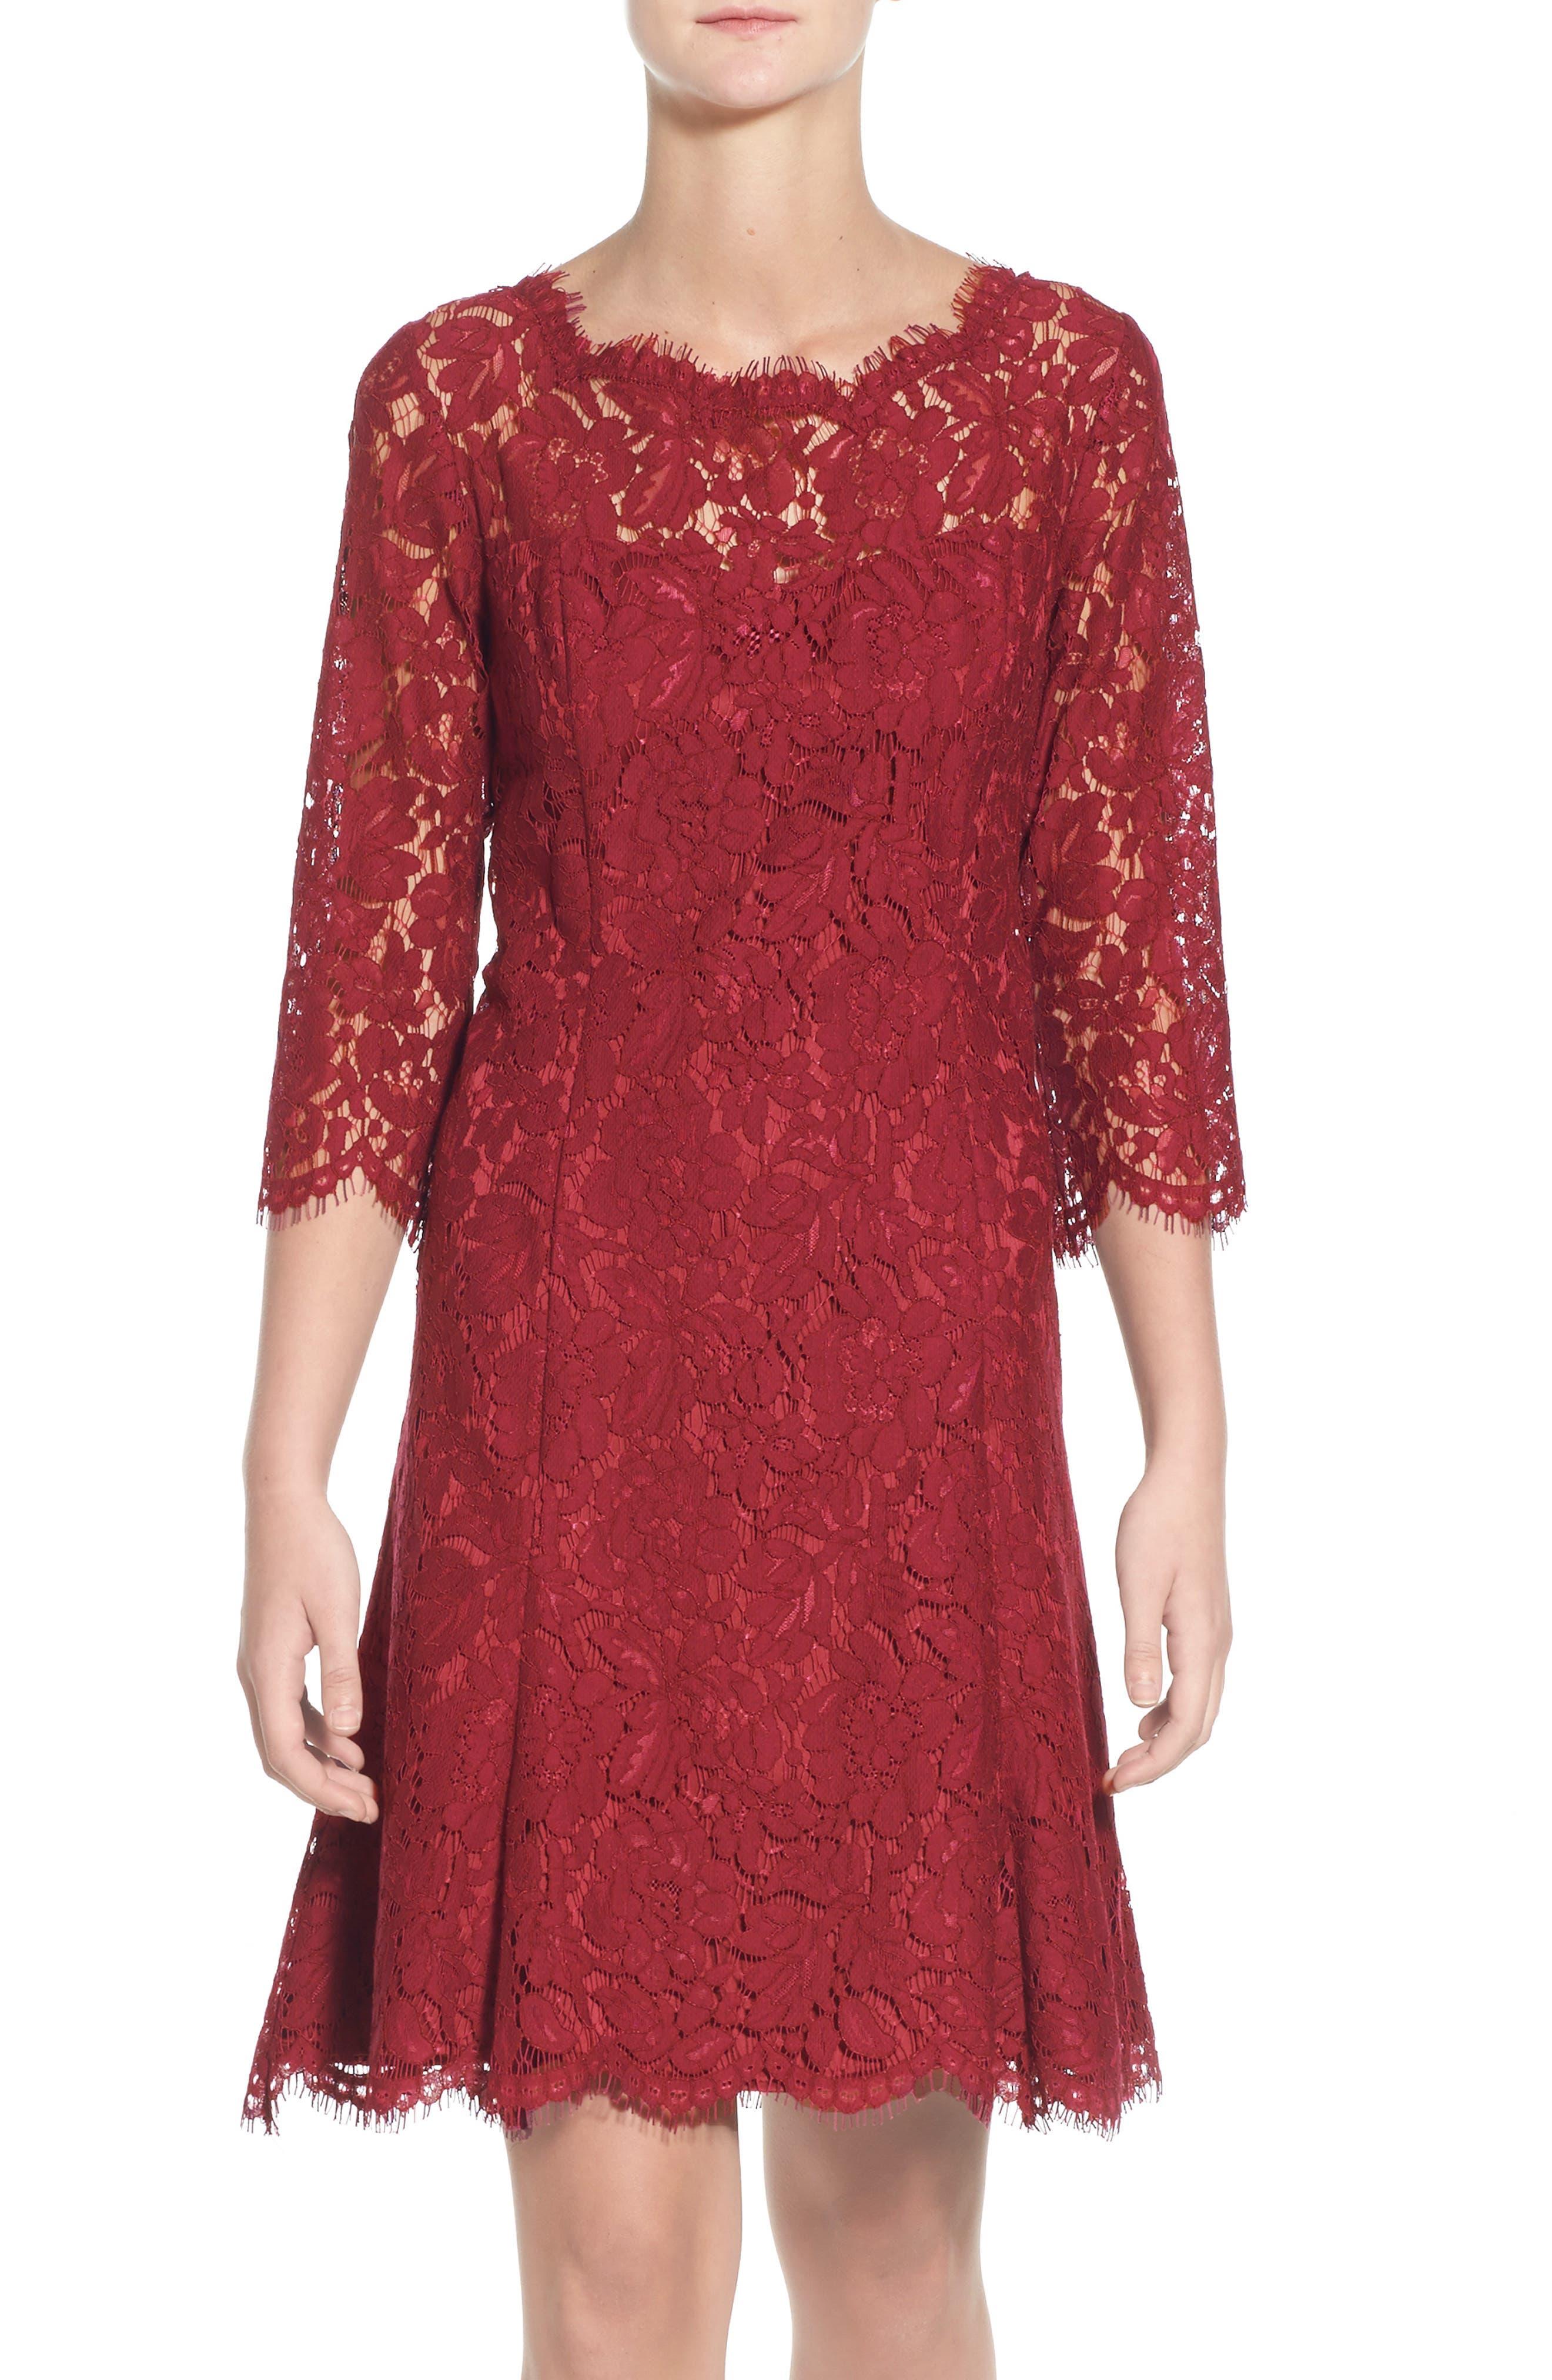 Eliza J Lace Fit & Flare Cocktail Dress, Burgundy